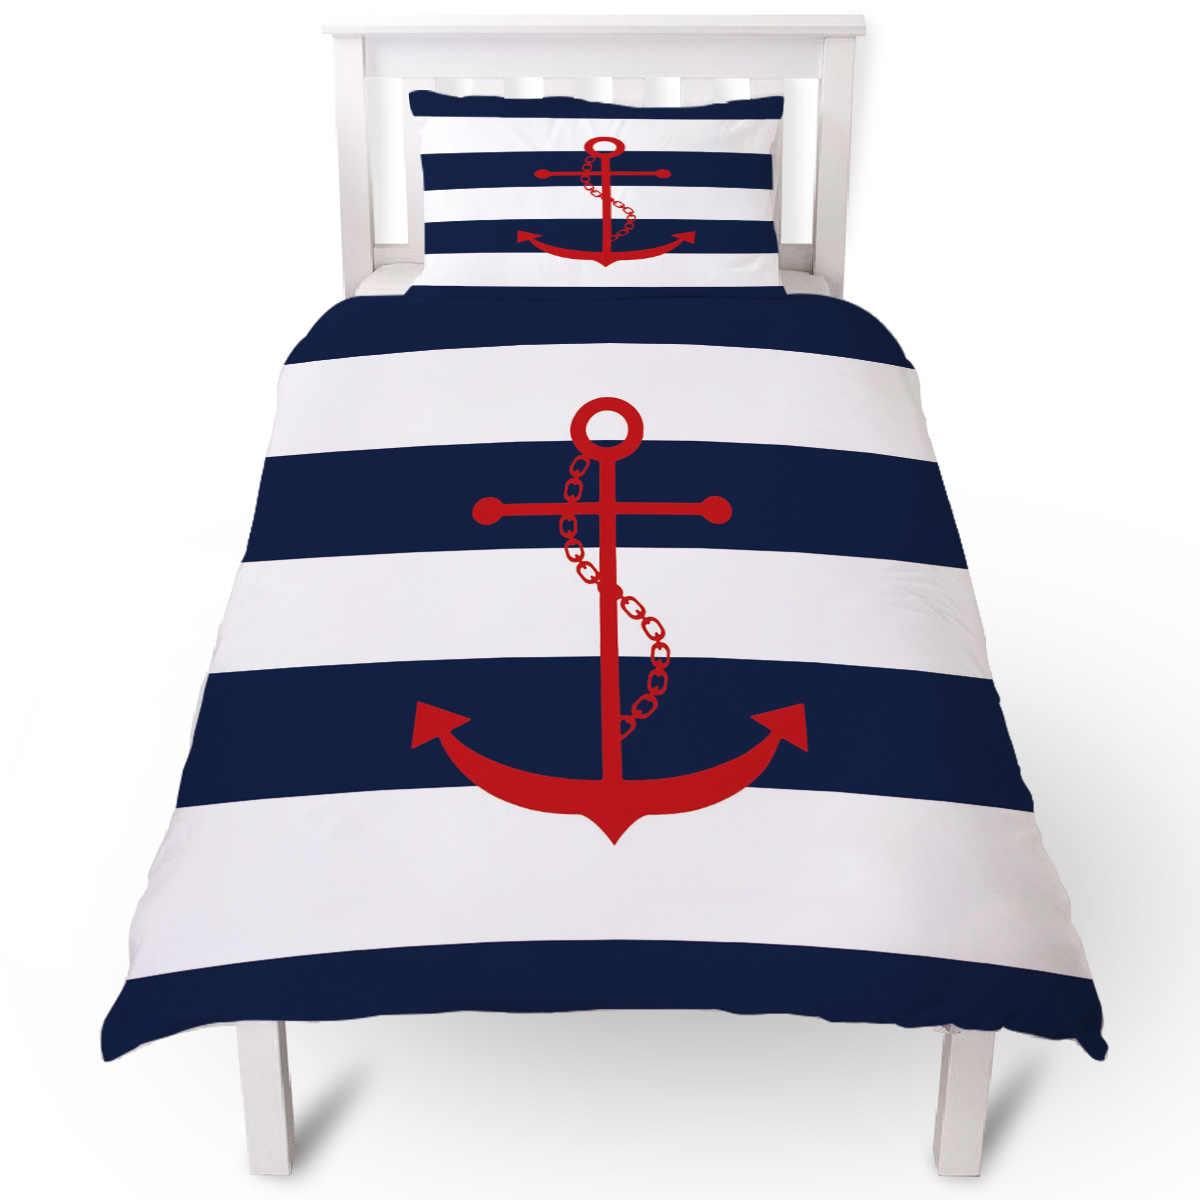 simple blue white stripes anchor duvet cover pillow case quilt cover set bedclothes single bedding sets for bed